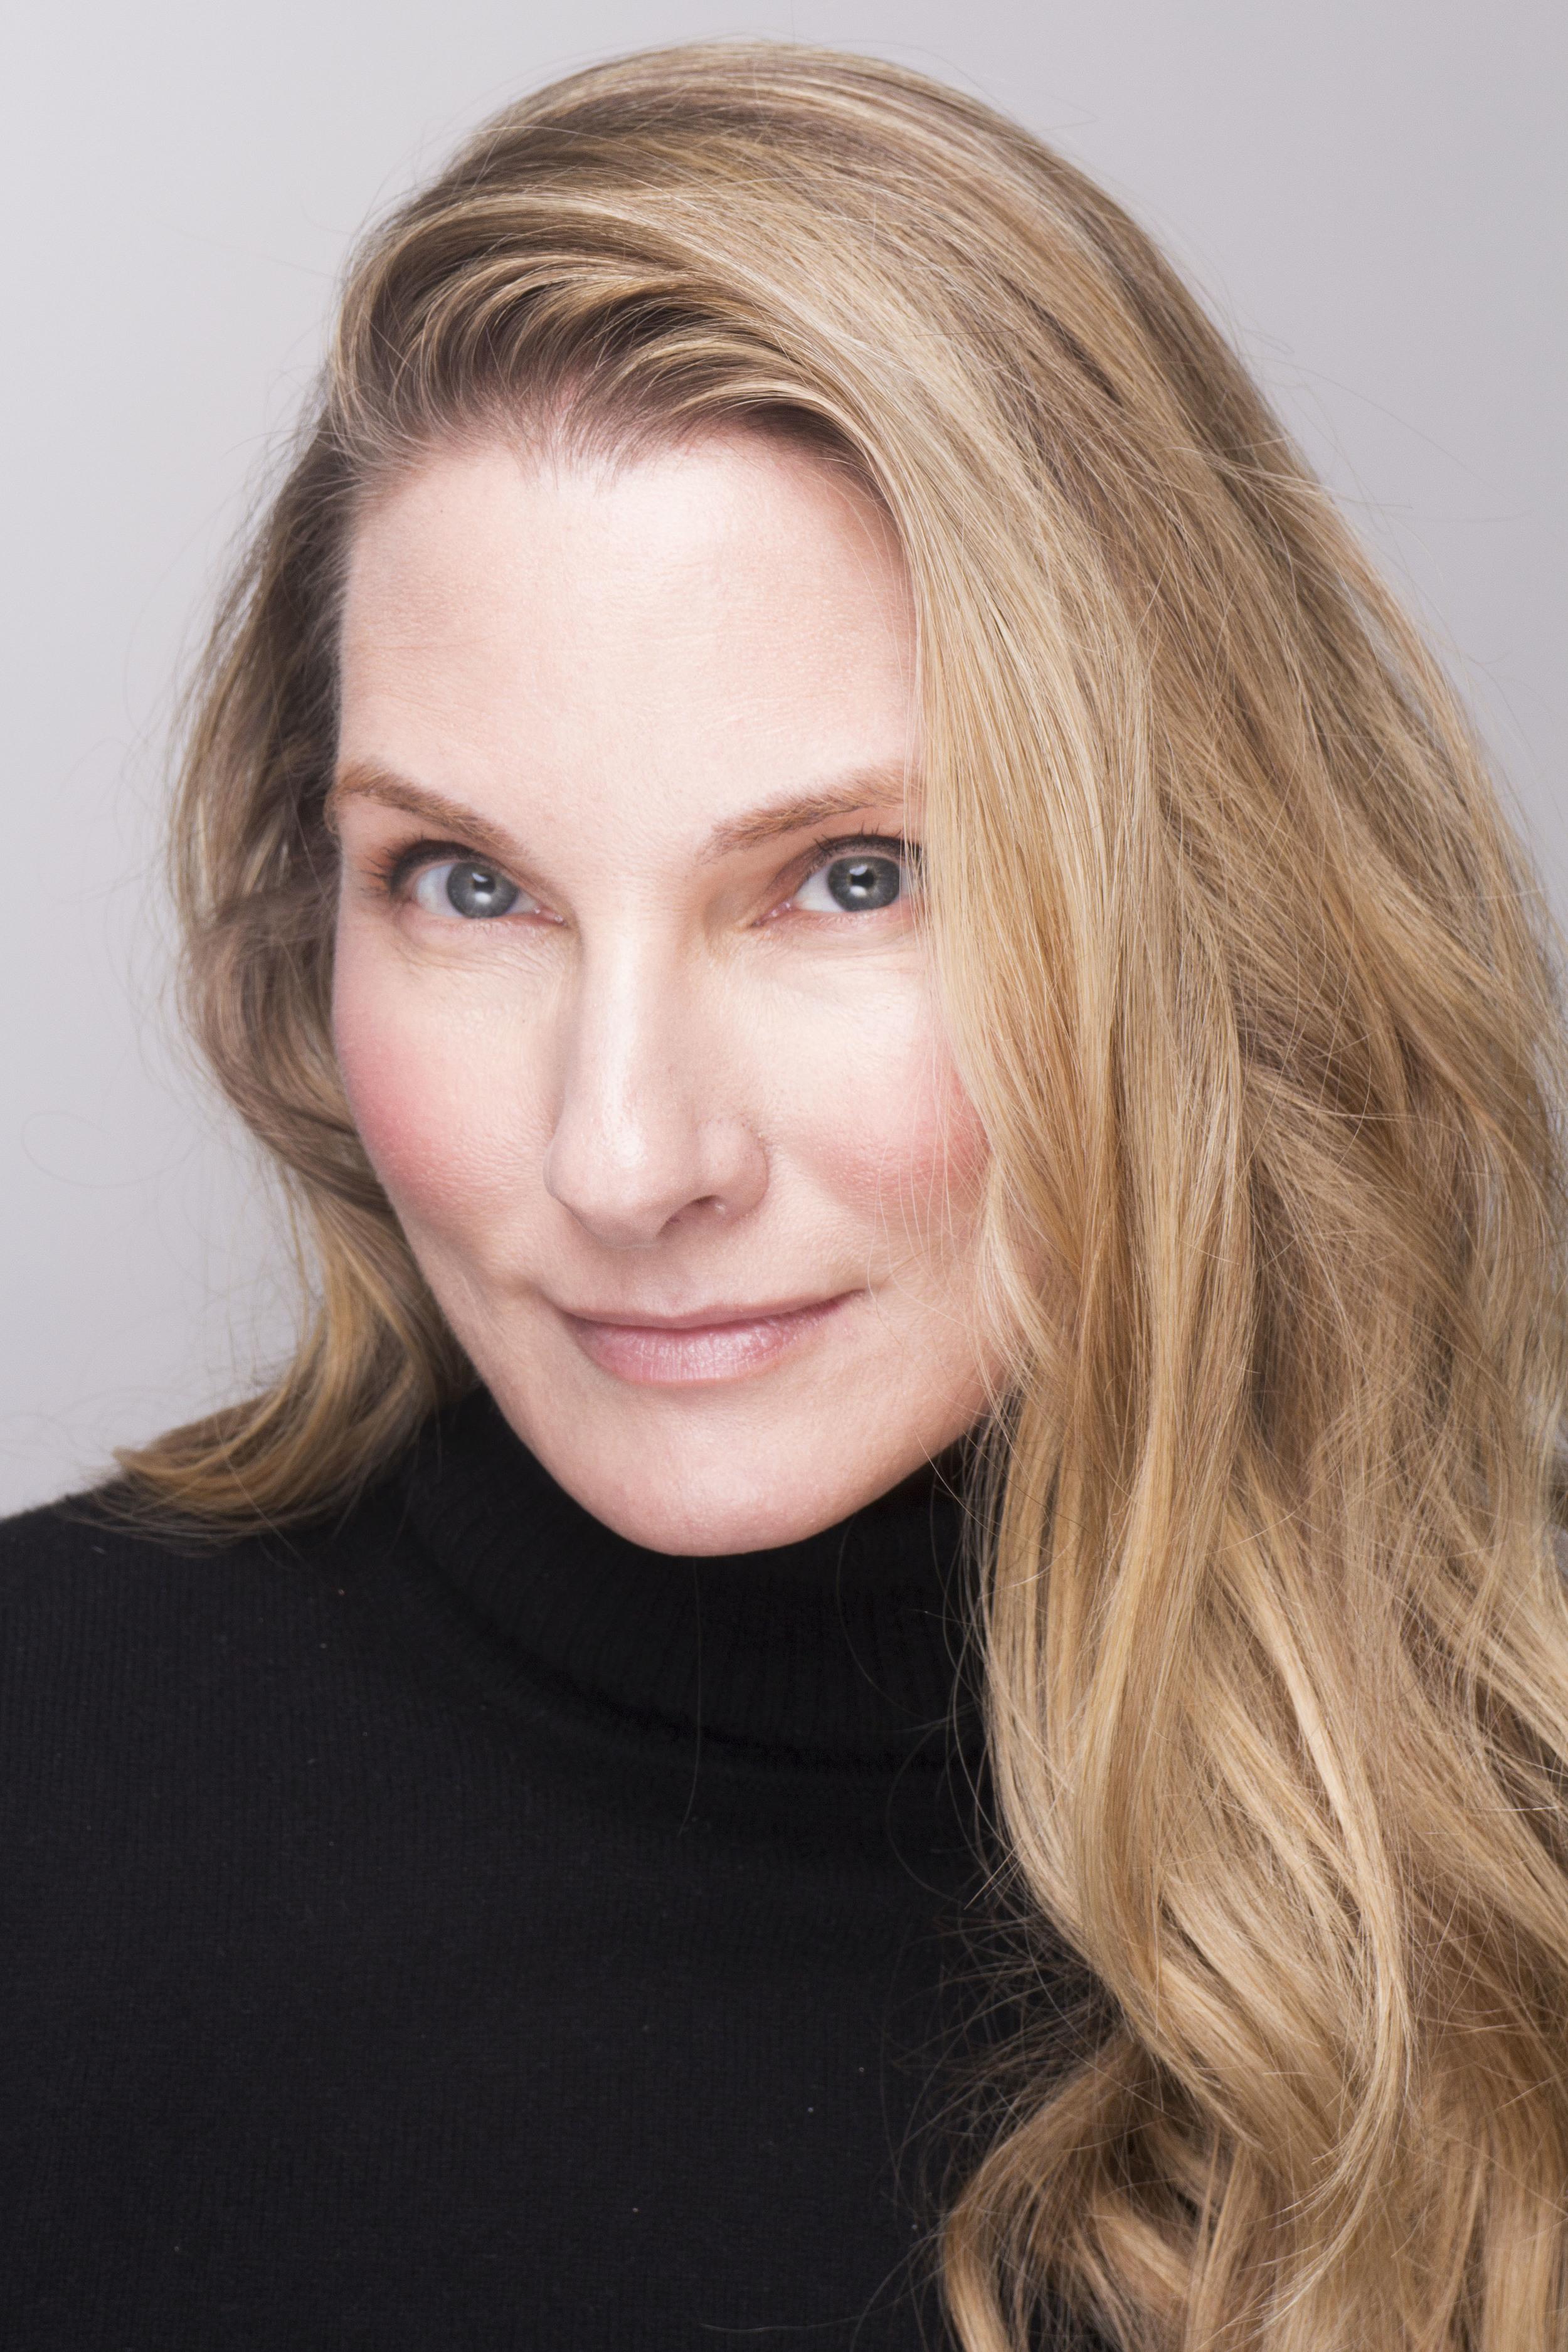 Photographer: Paul Tirado -Makeup: Lala Romain - Hair: Jake Aebly -Model: Susan Michels